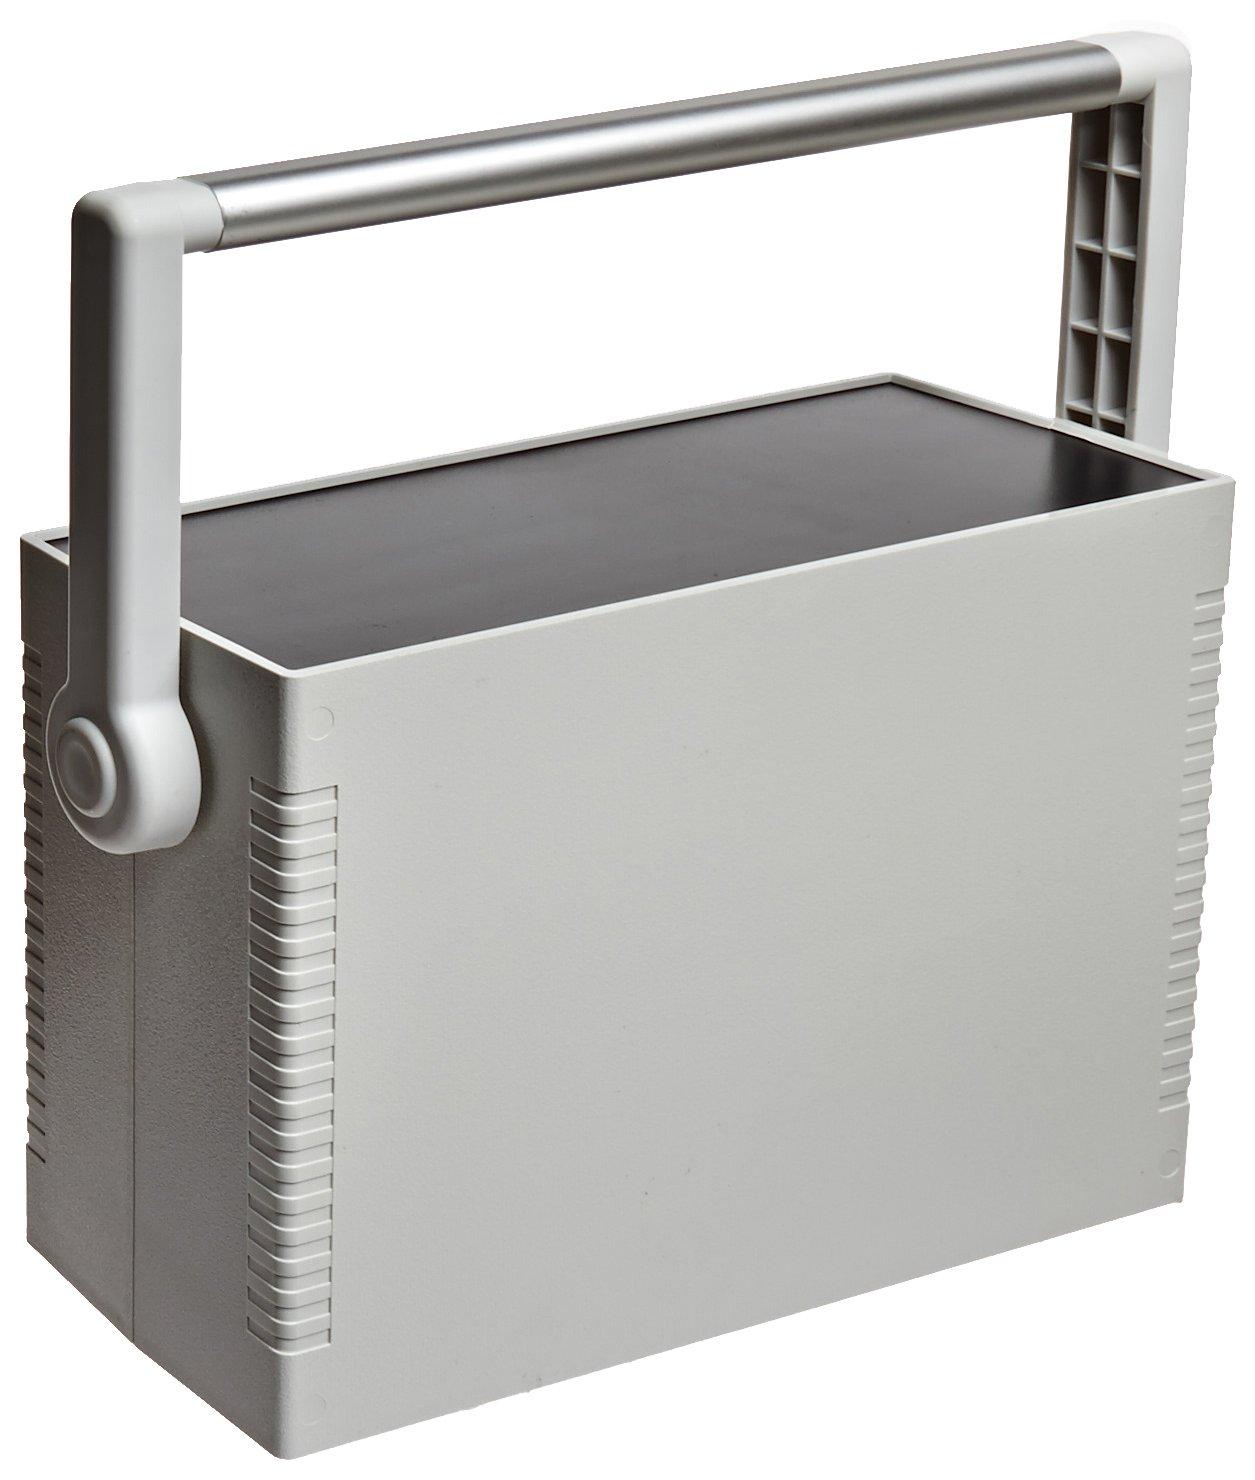 BUD Industries IP-6138 Plastic Instrument Case, 10-3/16'' Width x 4-1/8'' Height x 7-5/64'' Depth, Gray Finish